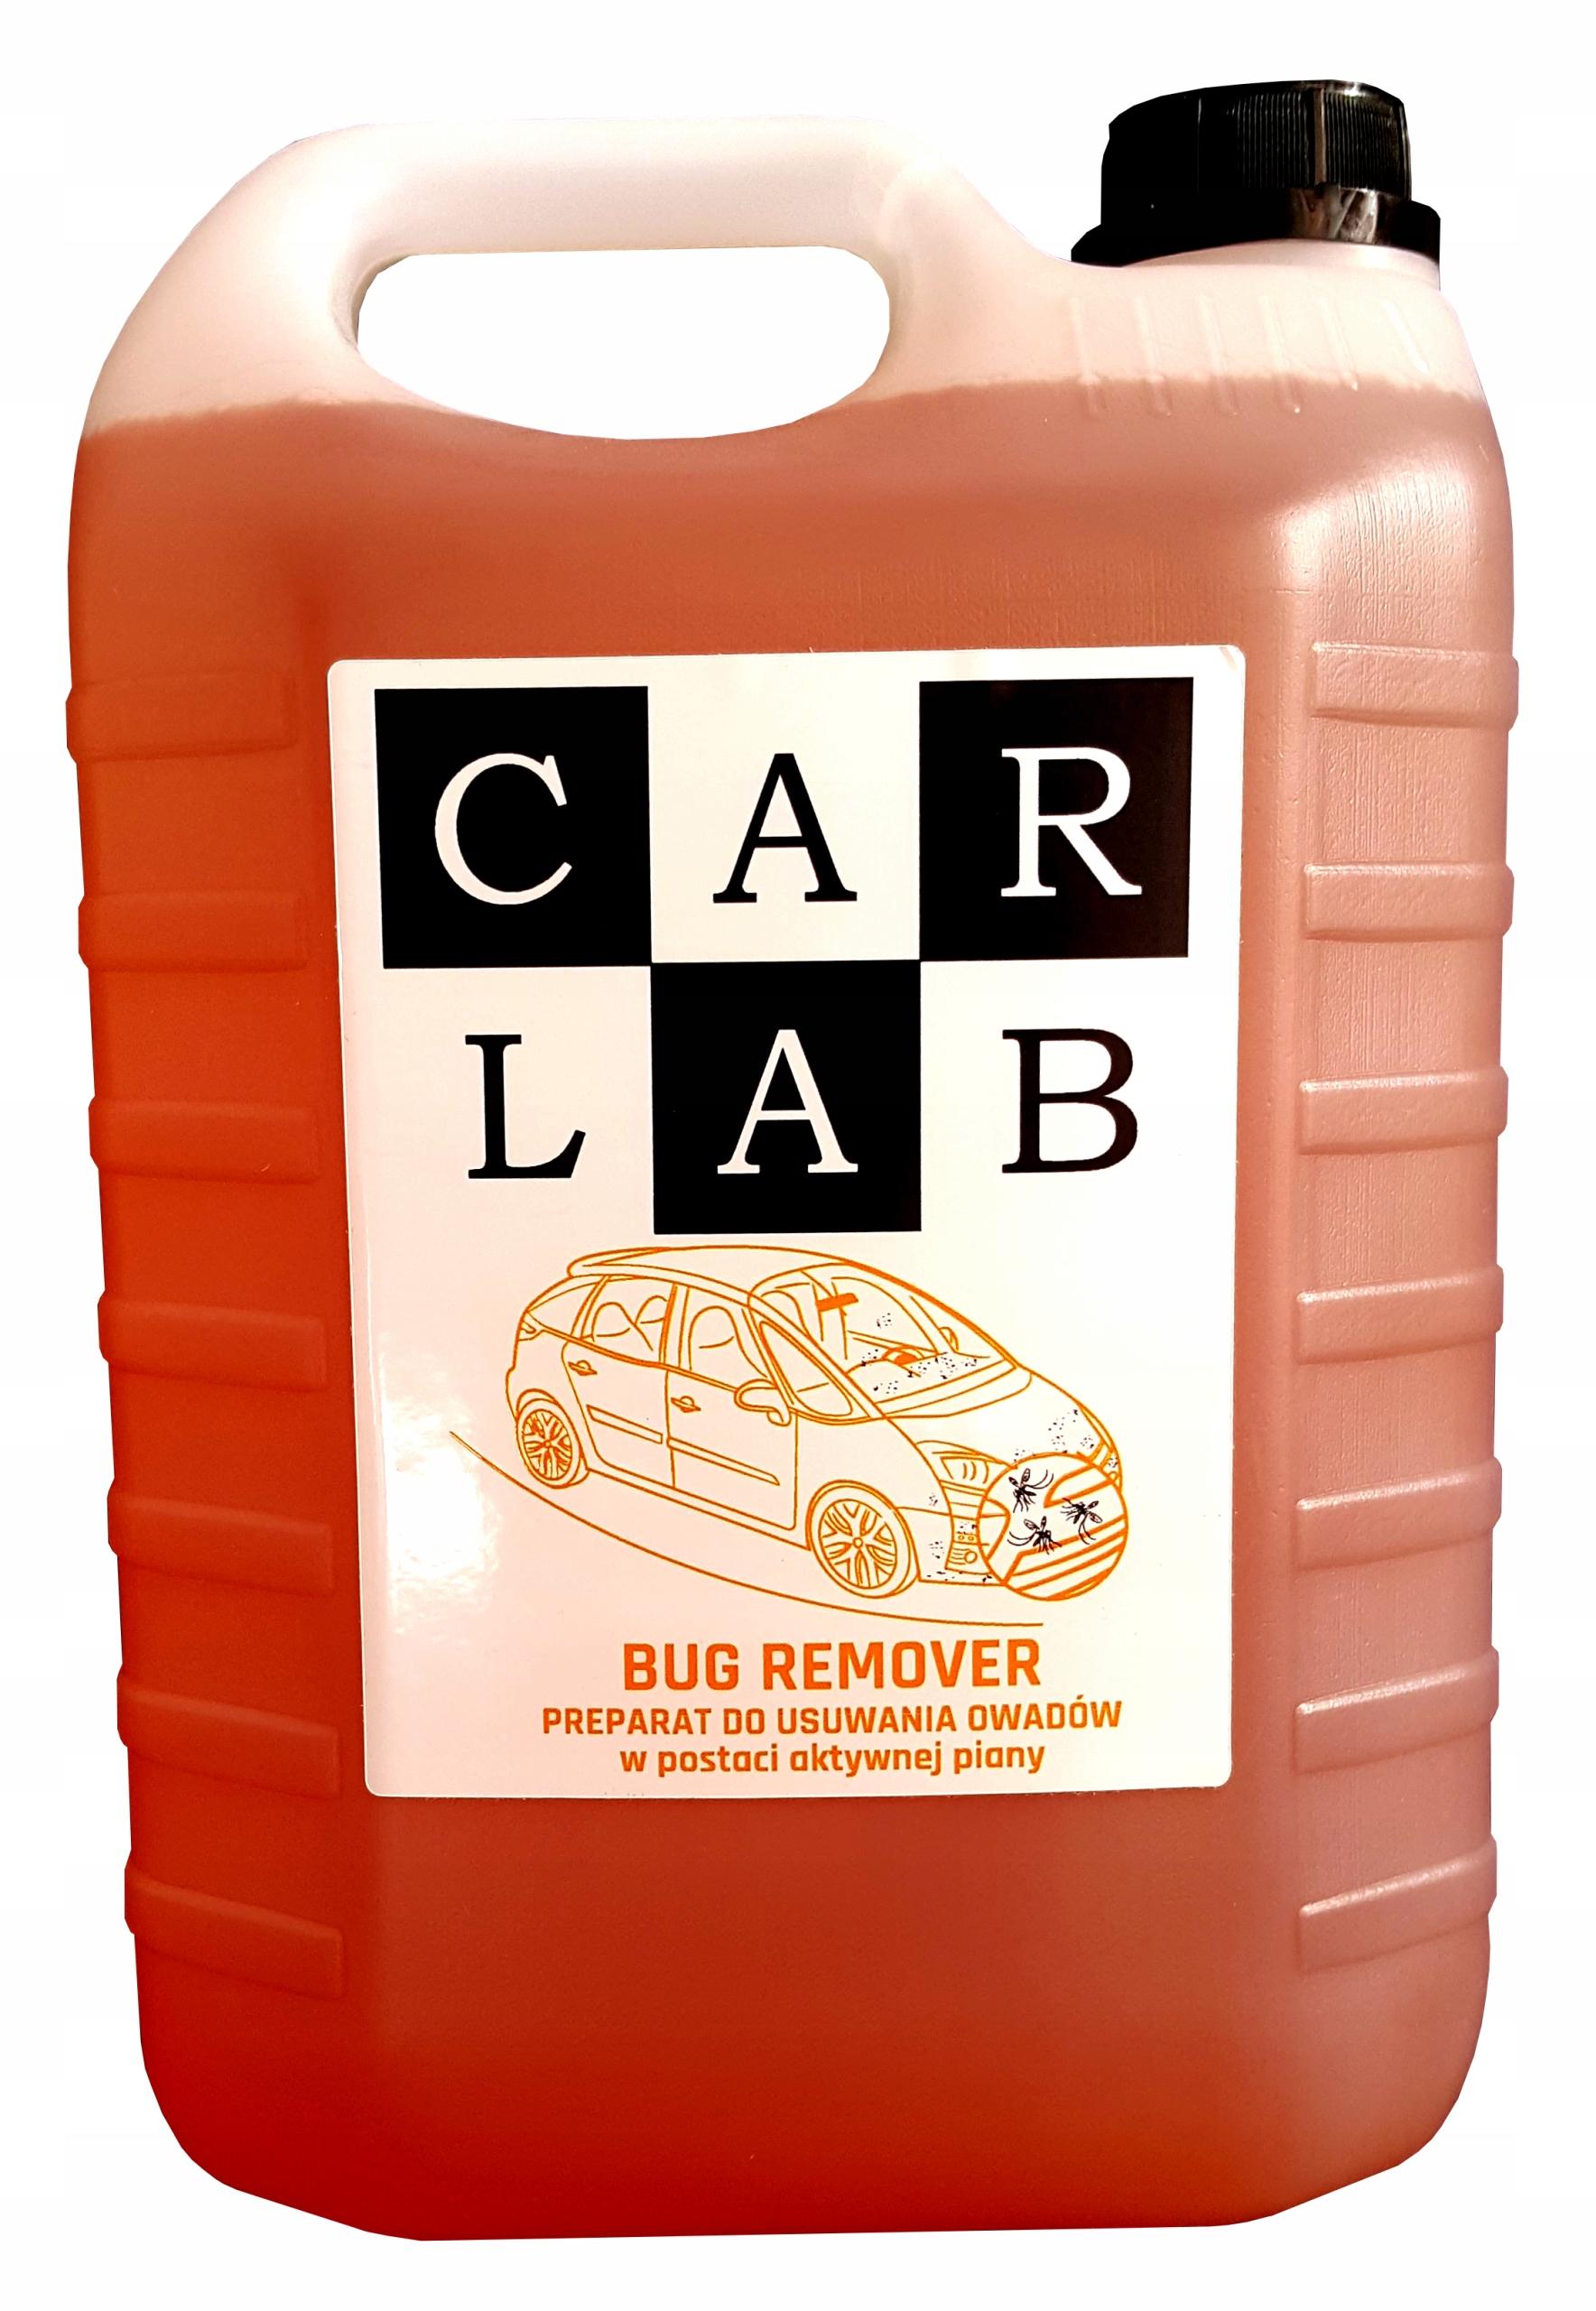 CARLAB BUG REMOVER 5L preparat do usuwania owadów